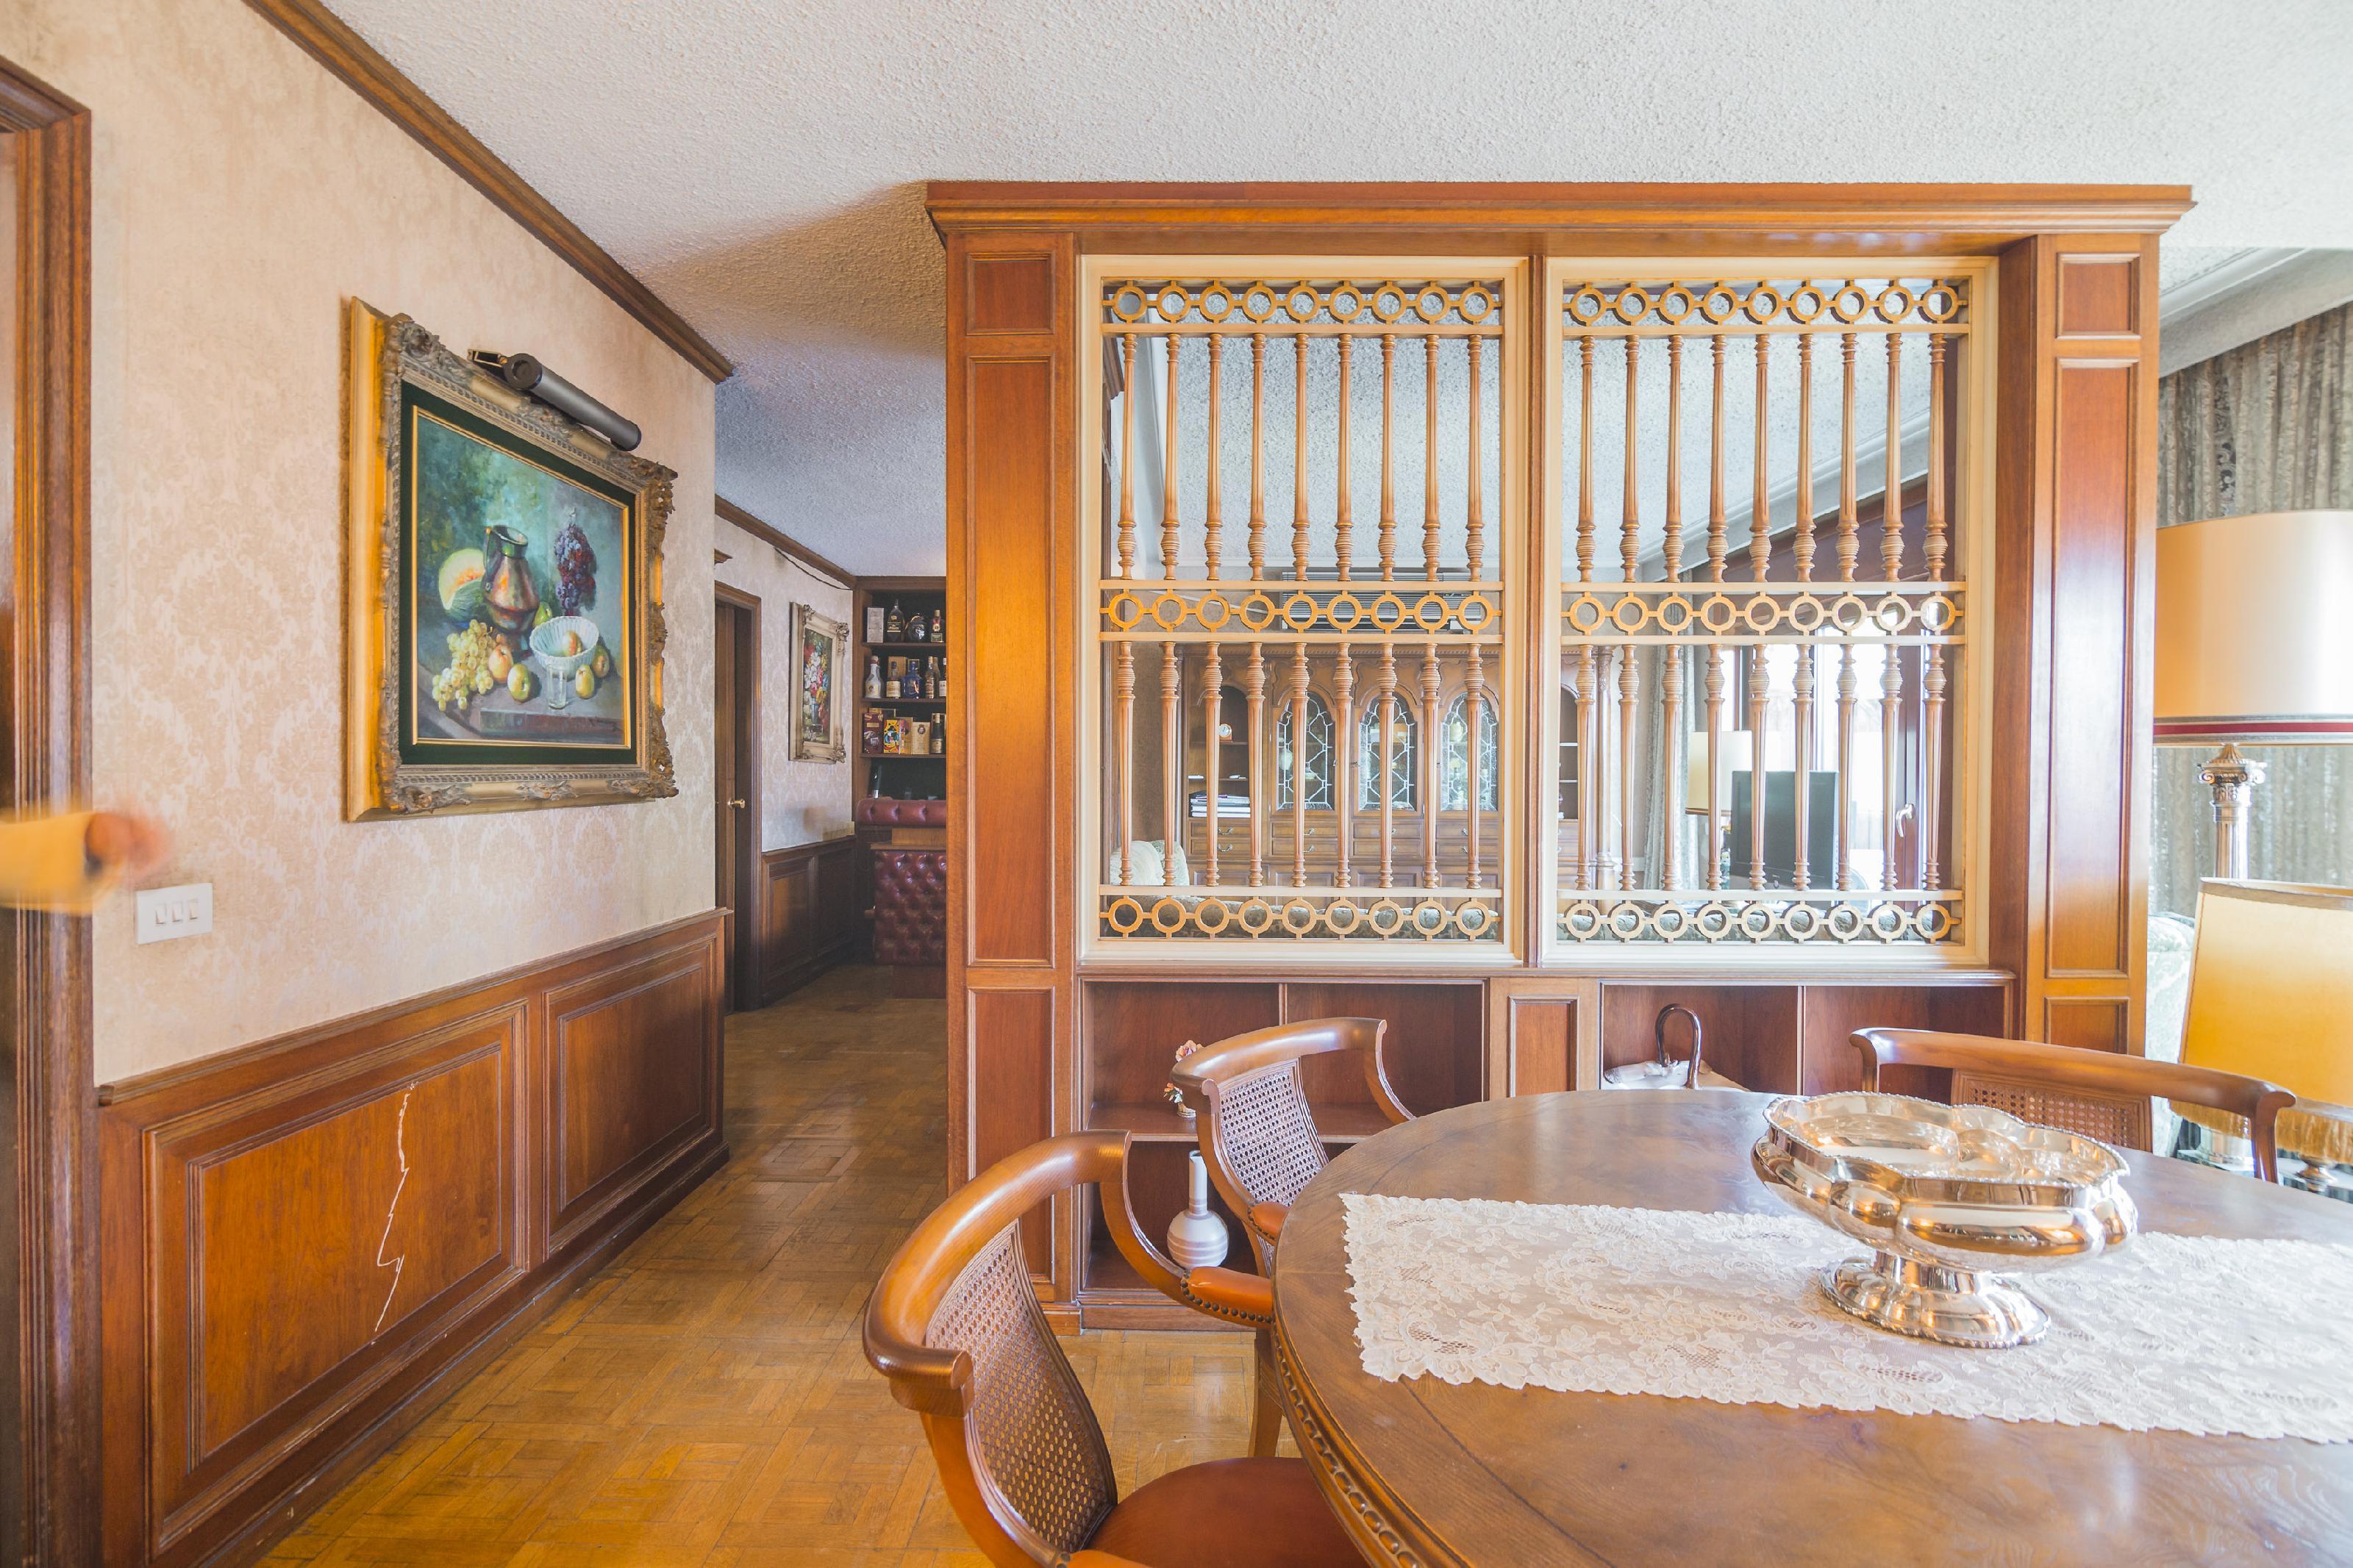 249856 Flat for sale in Sarrià-Sant Gervasi, Sant Gervasi-Galvany 13